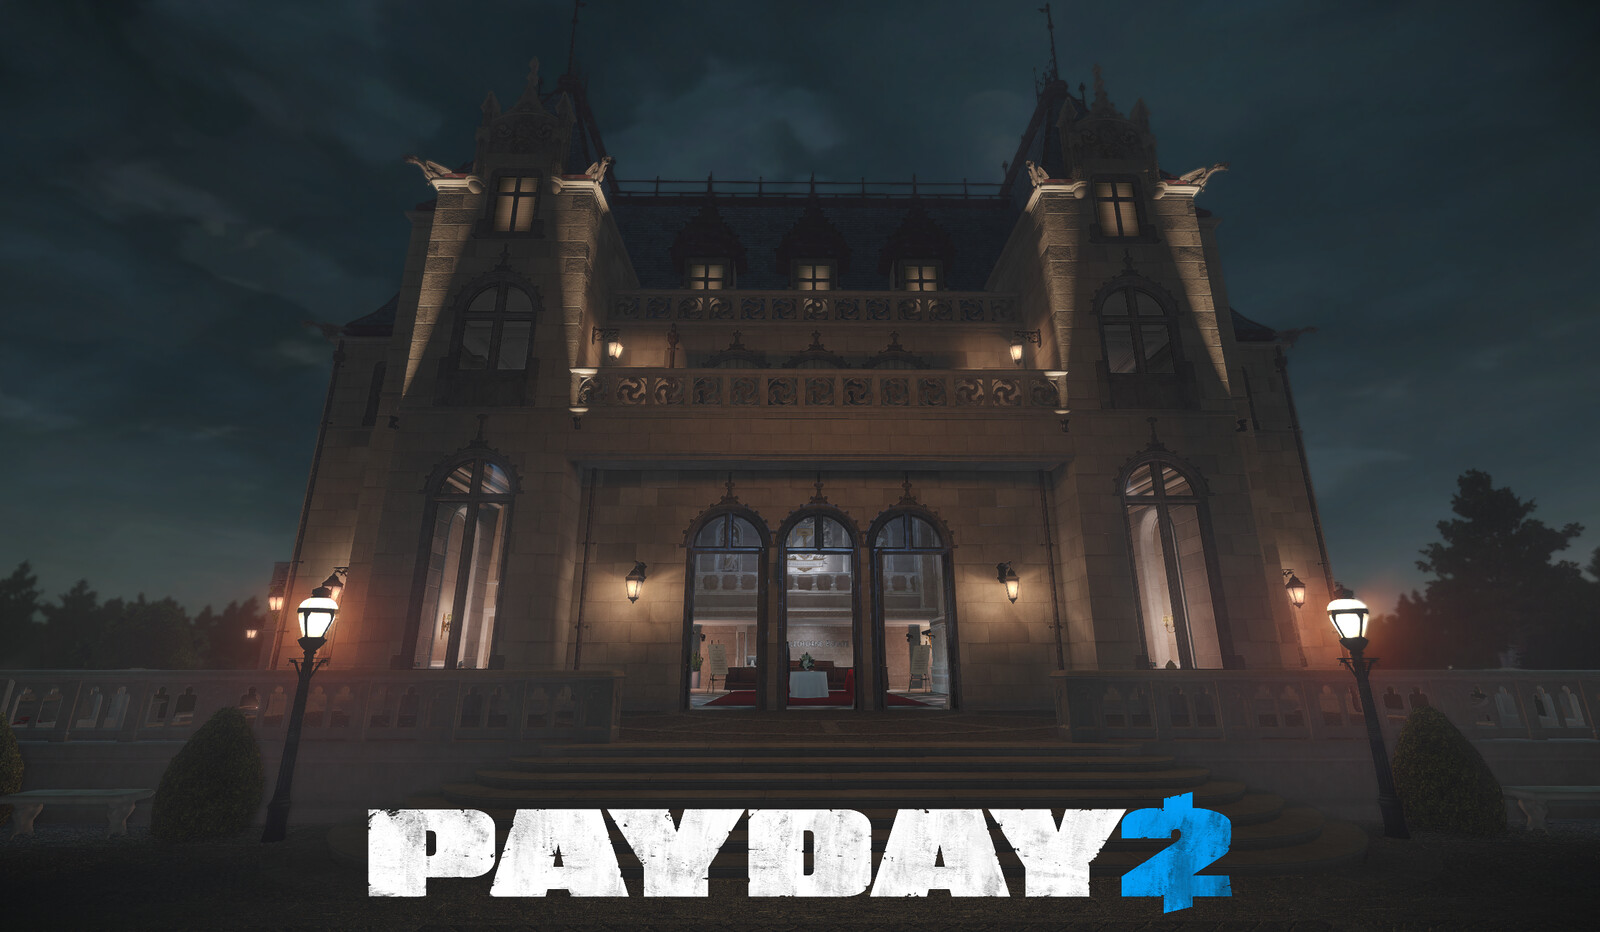 Payday 2: Shacklethorne Auction